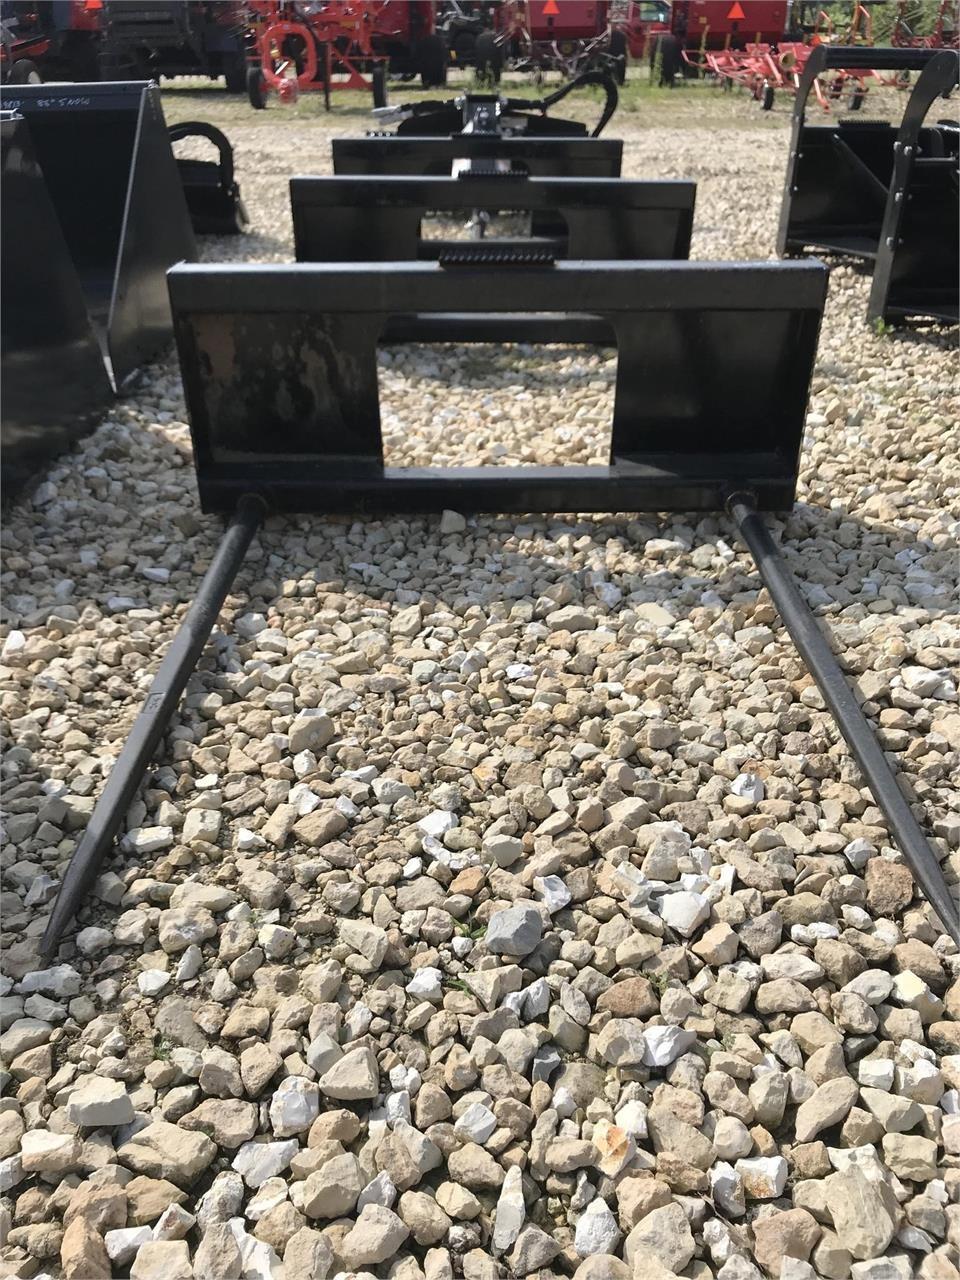 2018 PRIME Bale Fork Loader and Skid Steer Attachment